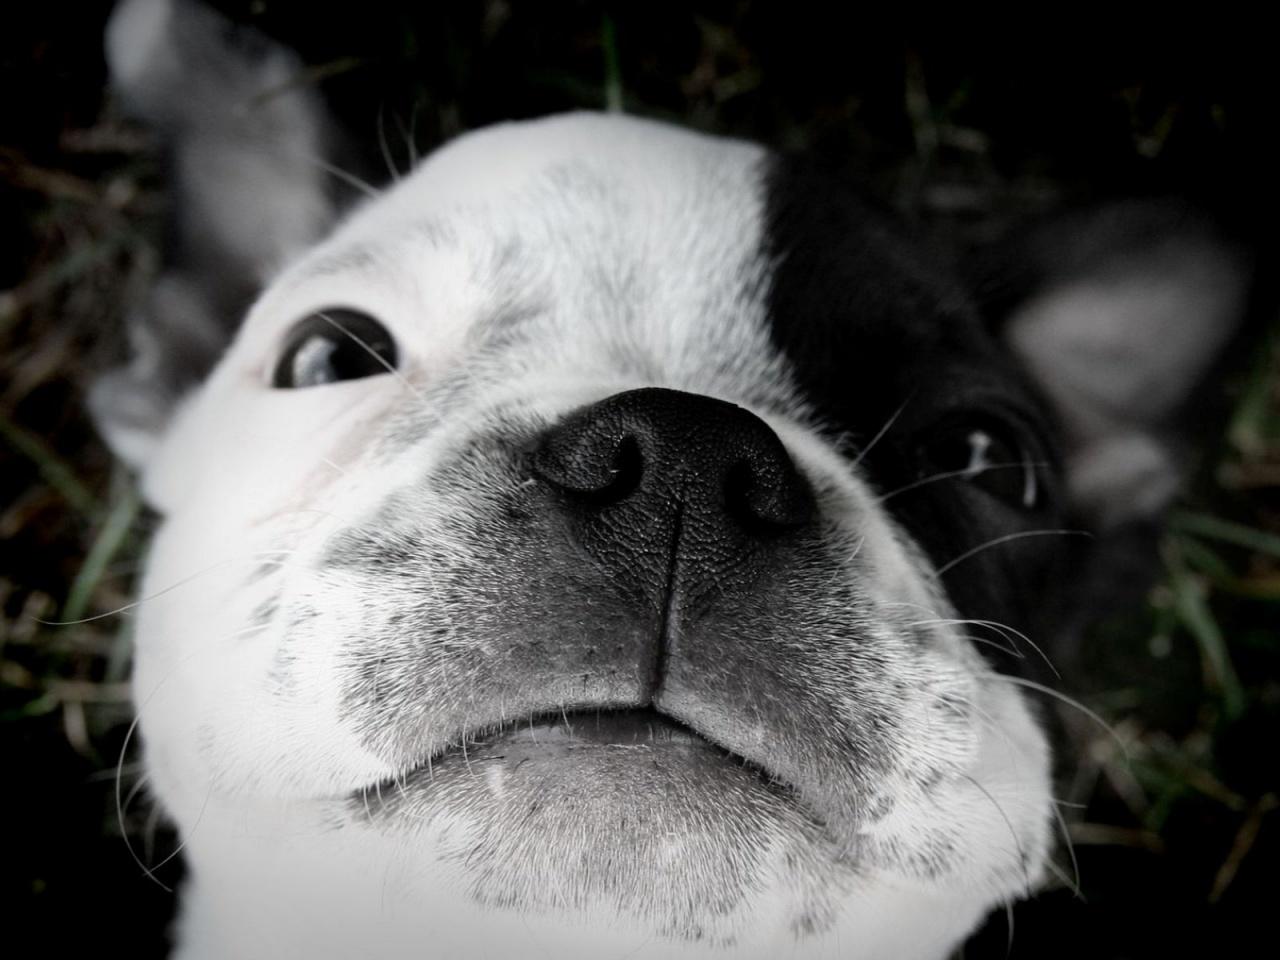 Cute Rat Wallpaper Hd 1366x768 Cute Puppy Dogs Cute Boston Terrier Puppies